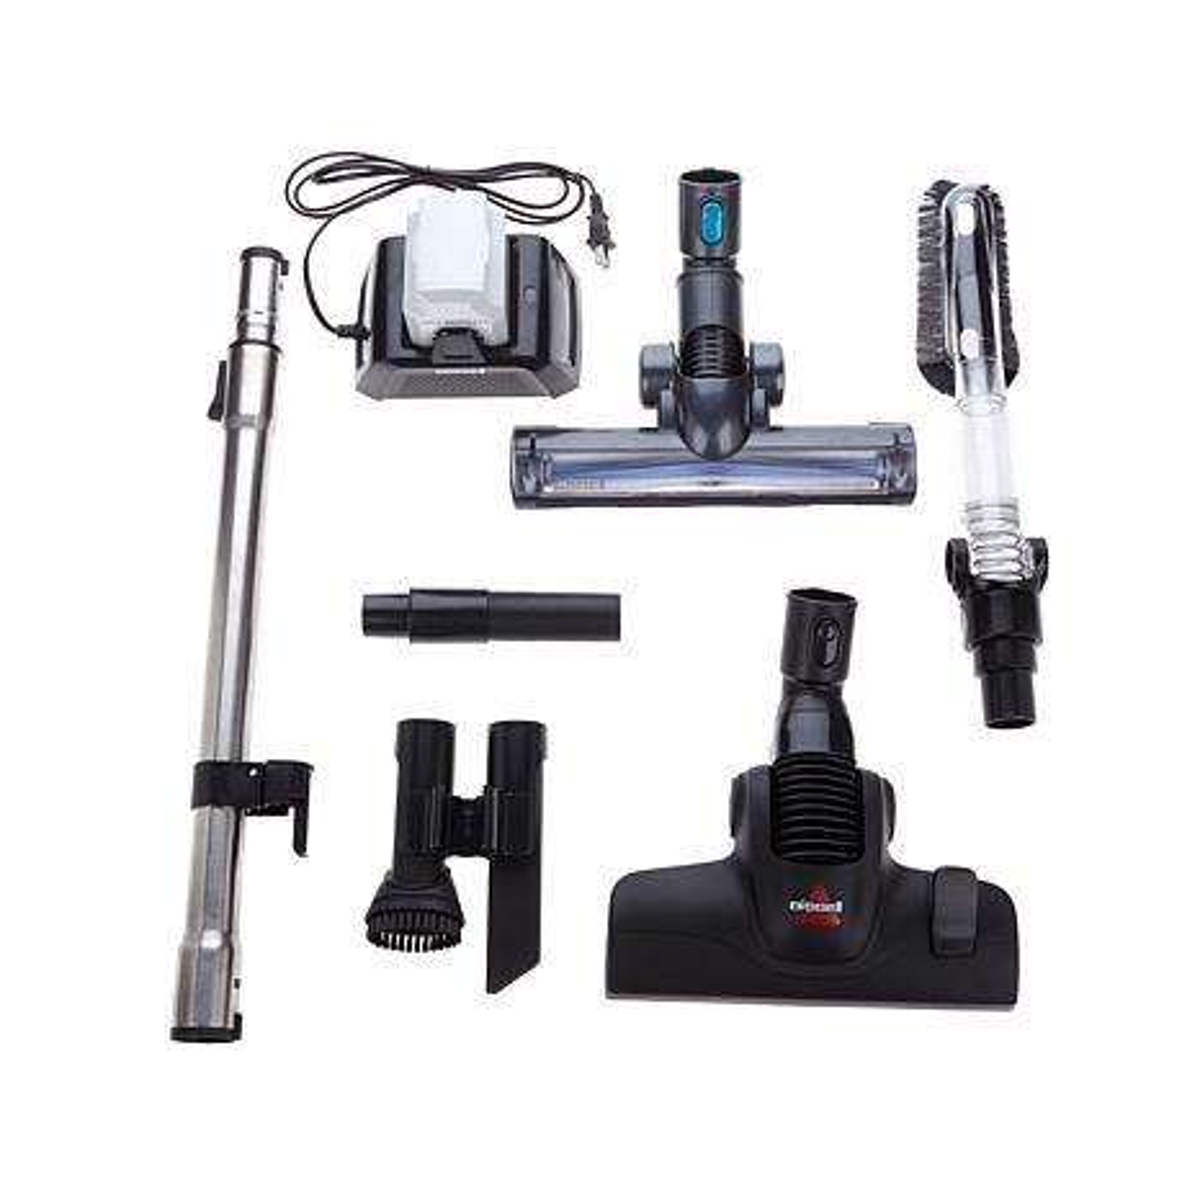 BISSELL Hard Floor Expert Cordless Vacuum  8293517  HSN